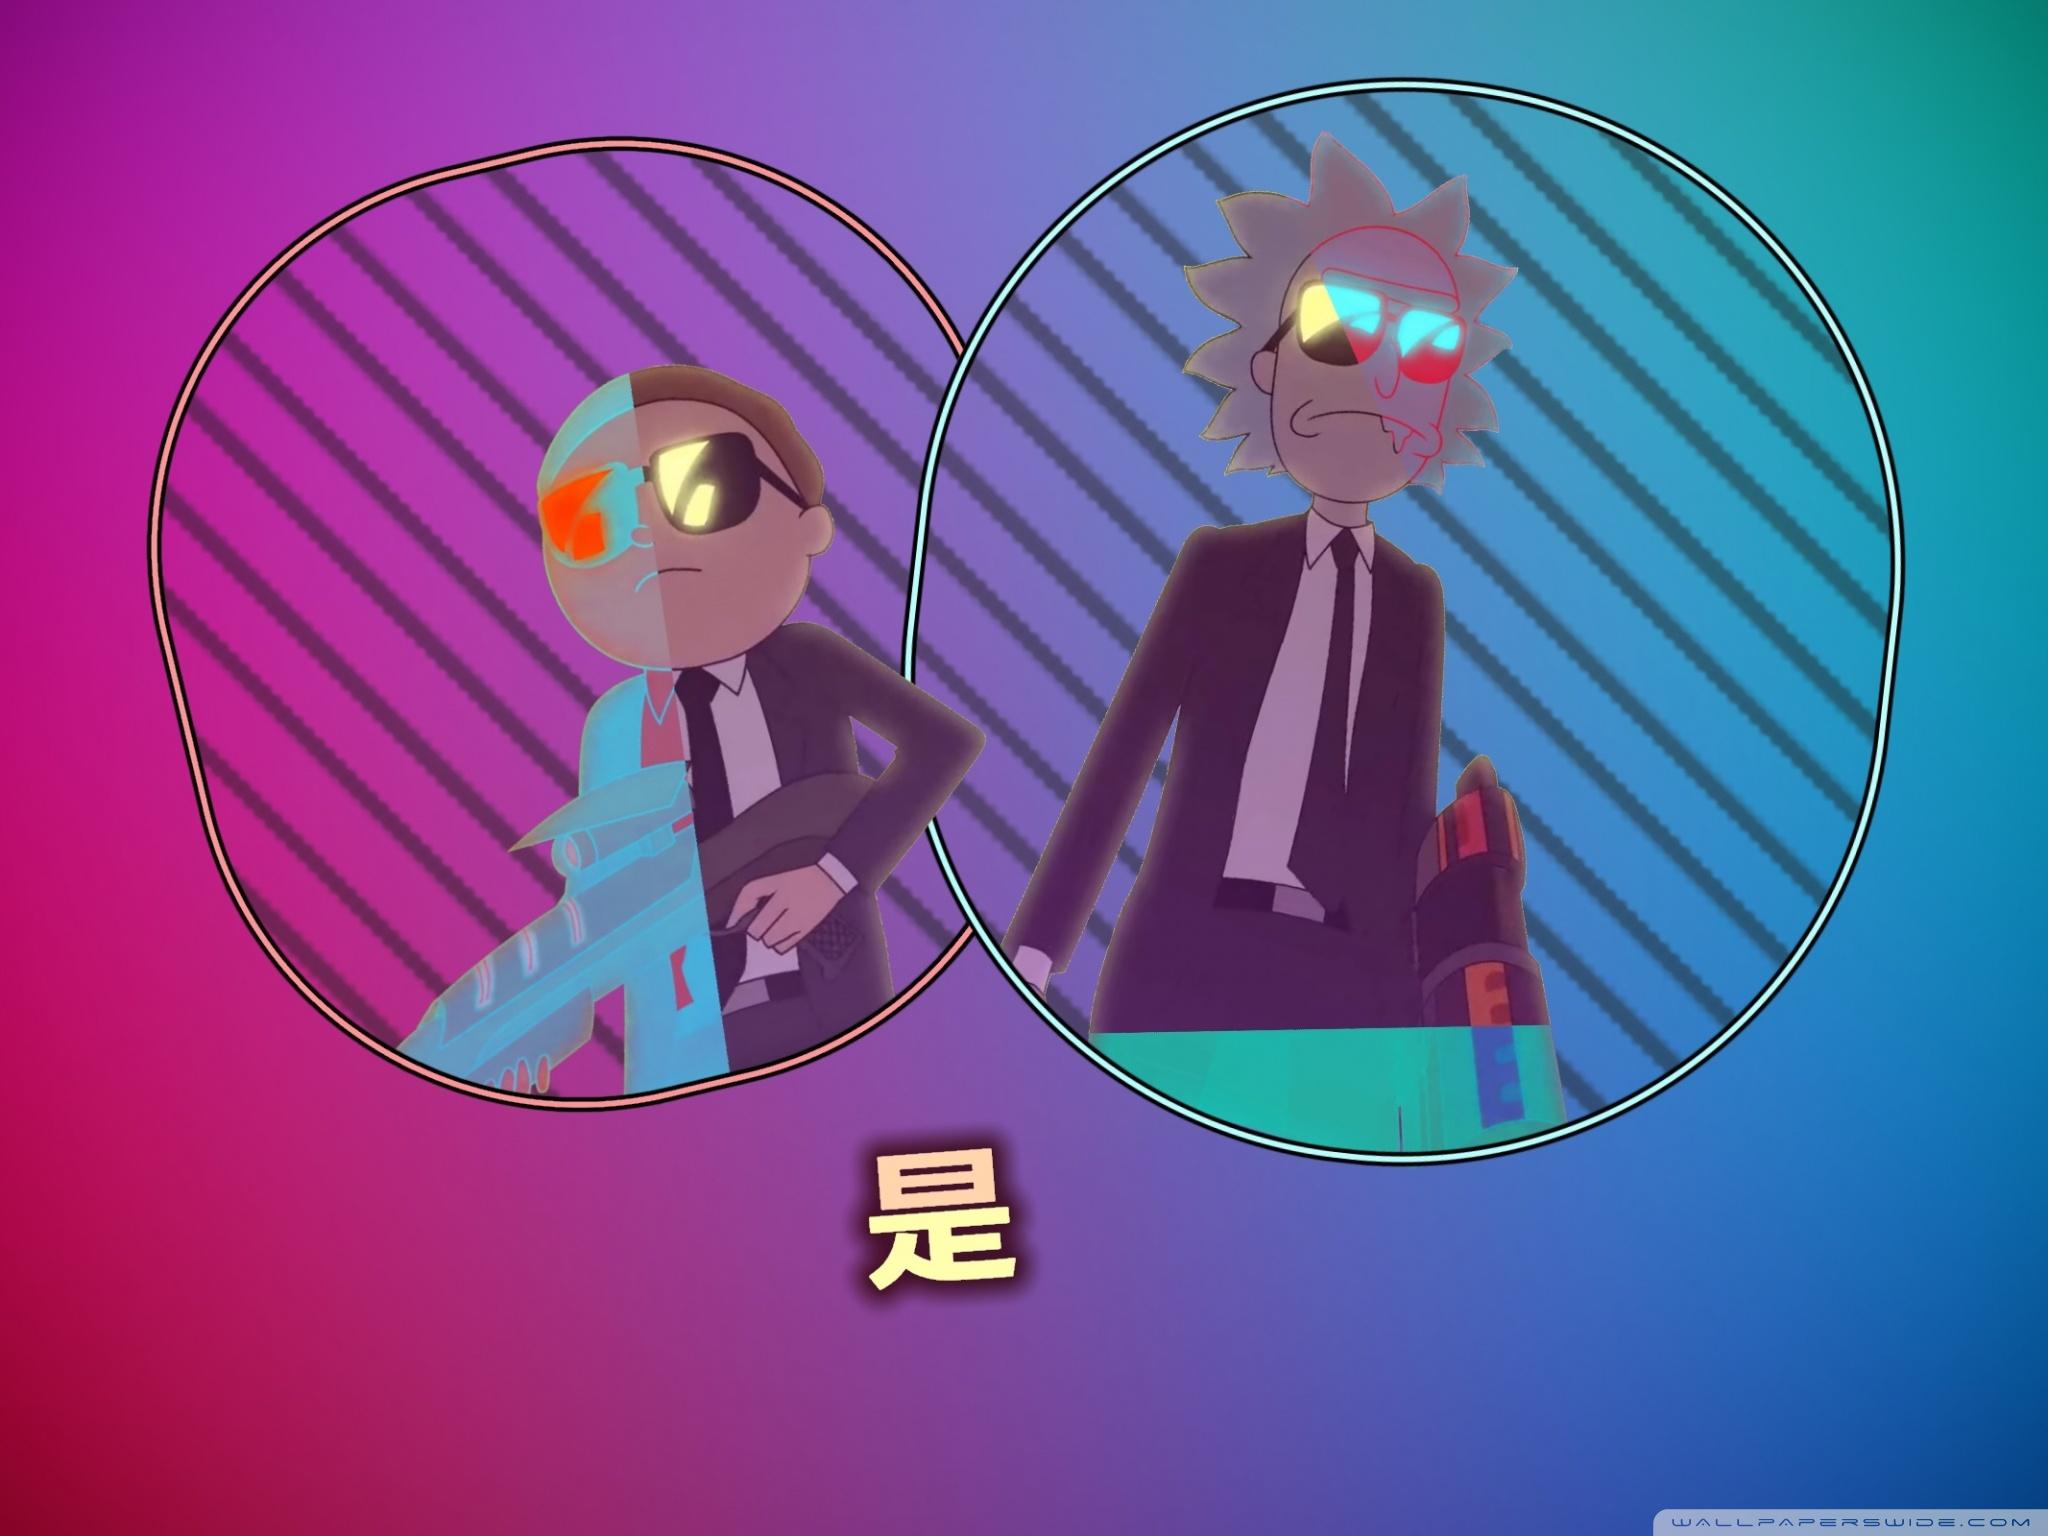 Rick And Morty Retro   2048x1536 Wallpaper   Ecopetitcat 2048x1536